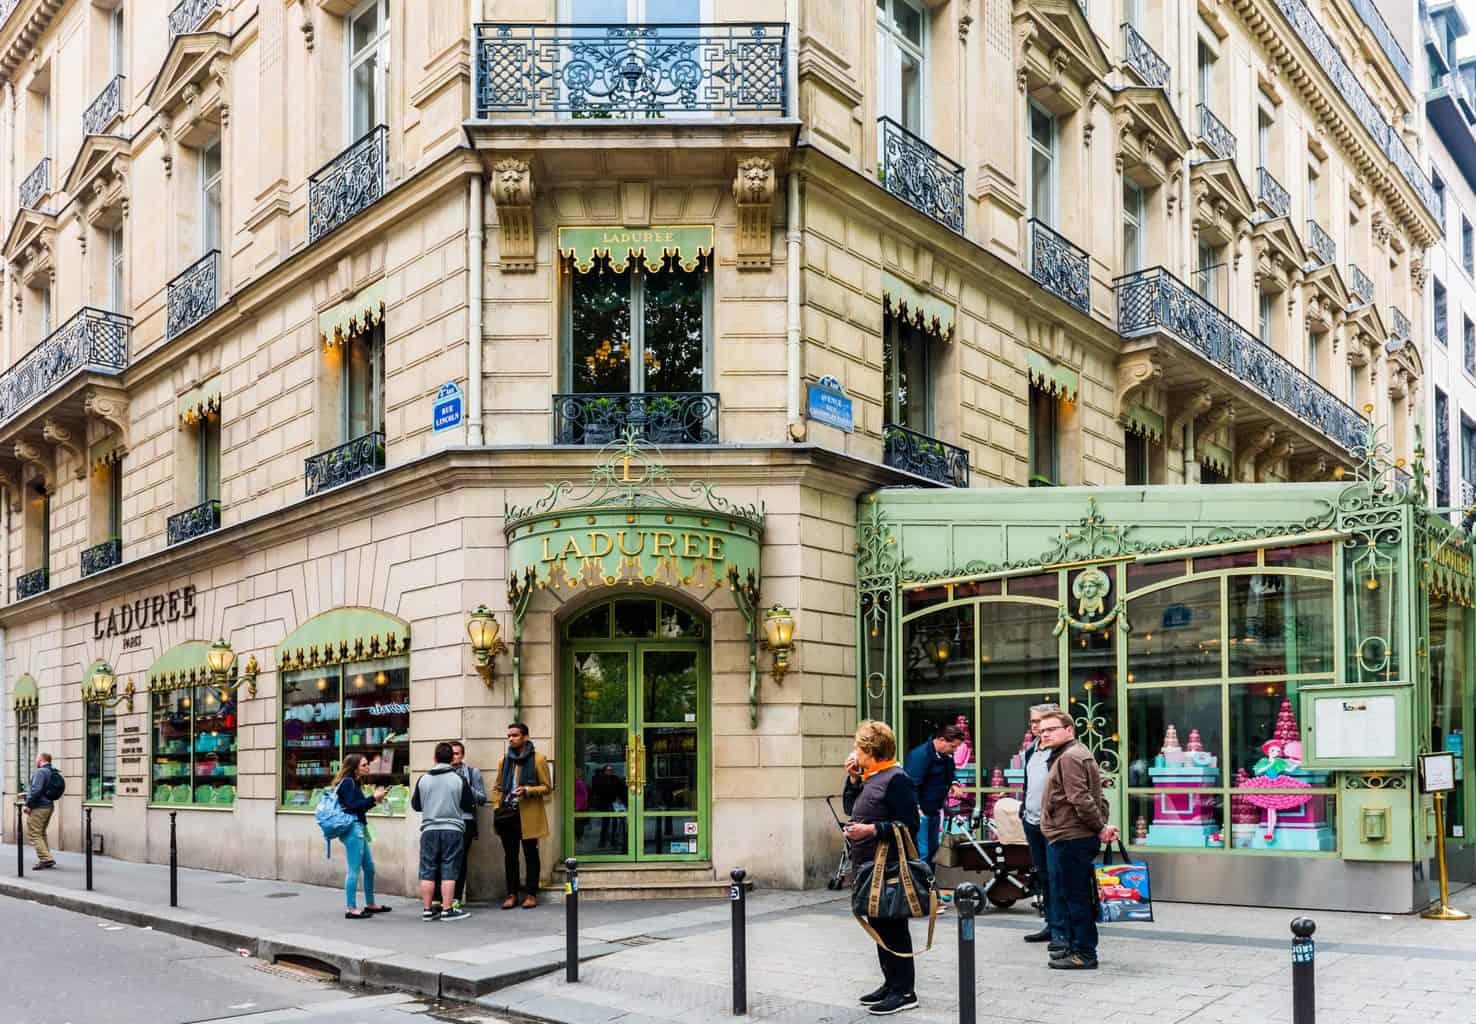 The one and only Ladurée Cafe, which sits along Paris' immortal, Champs Elysées